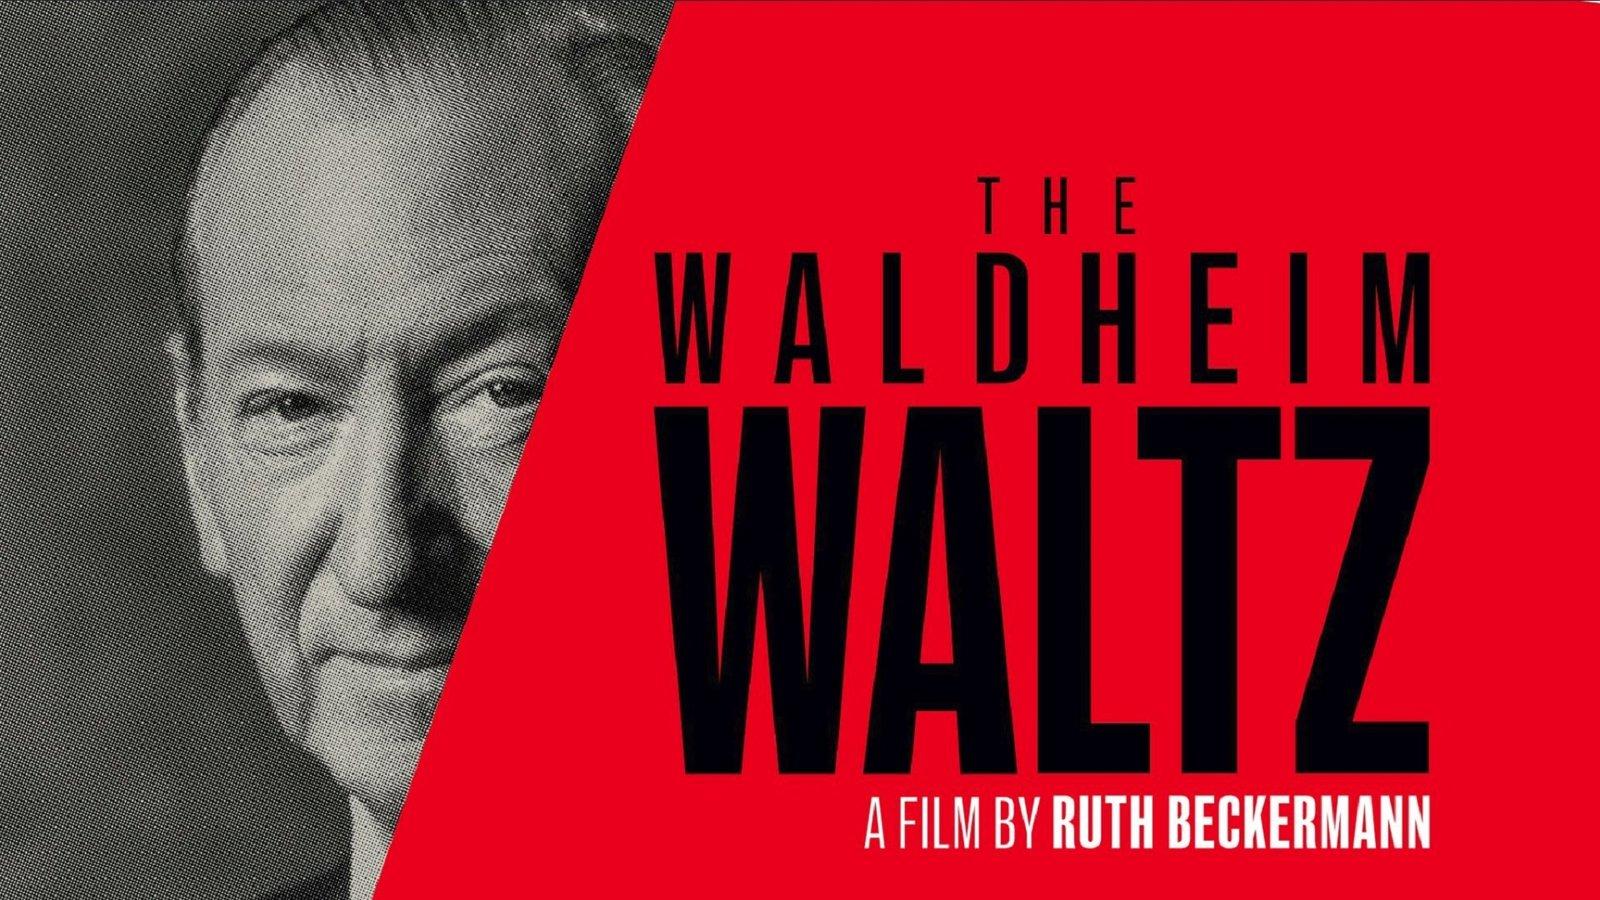 The Waldheim Waltz - Investigating Former UN Secretary General Kurt Waldheim